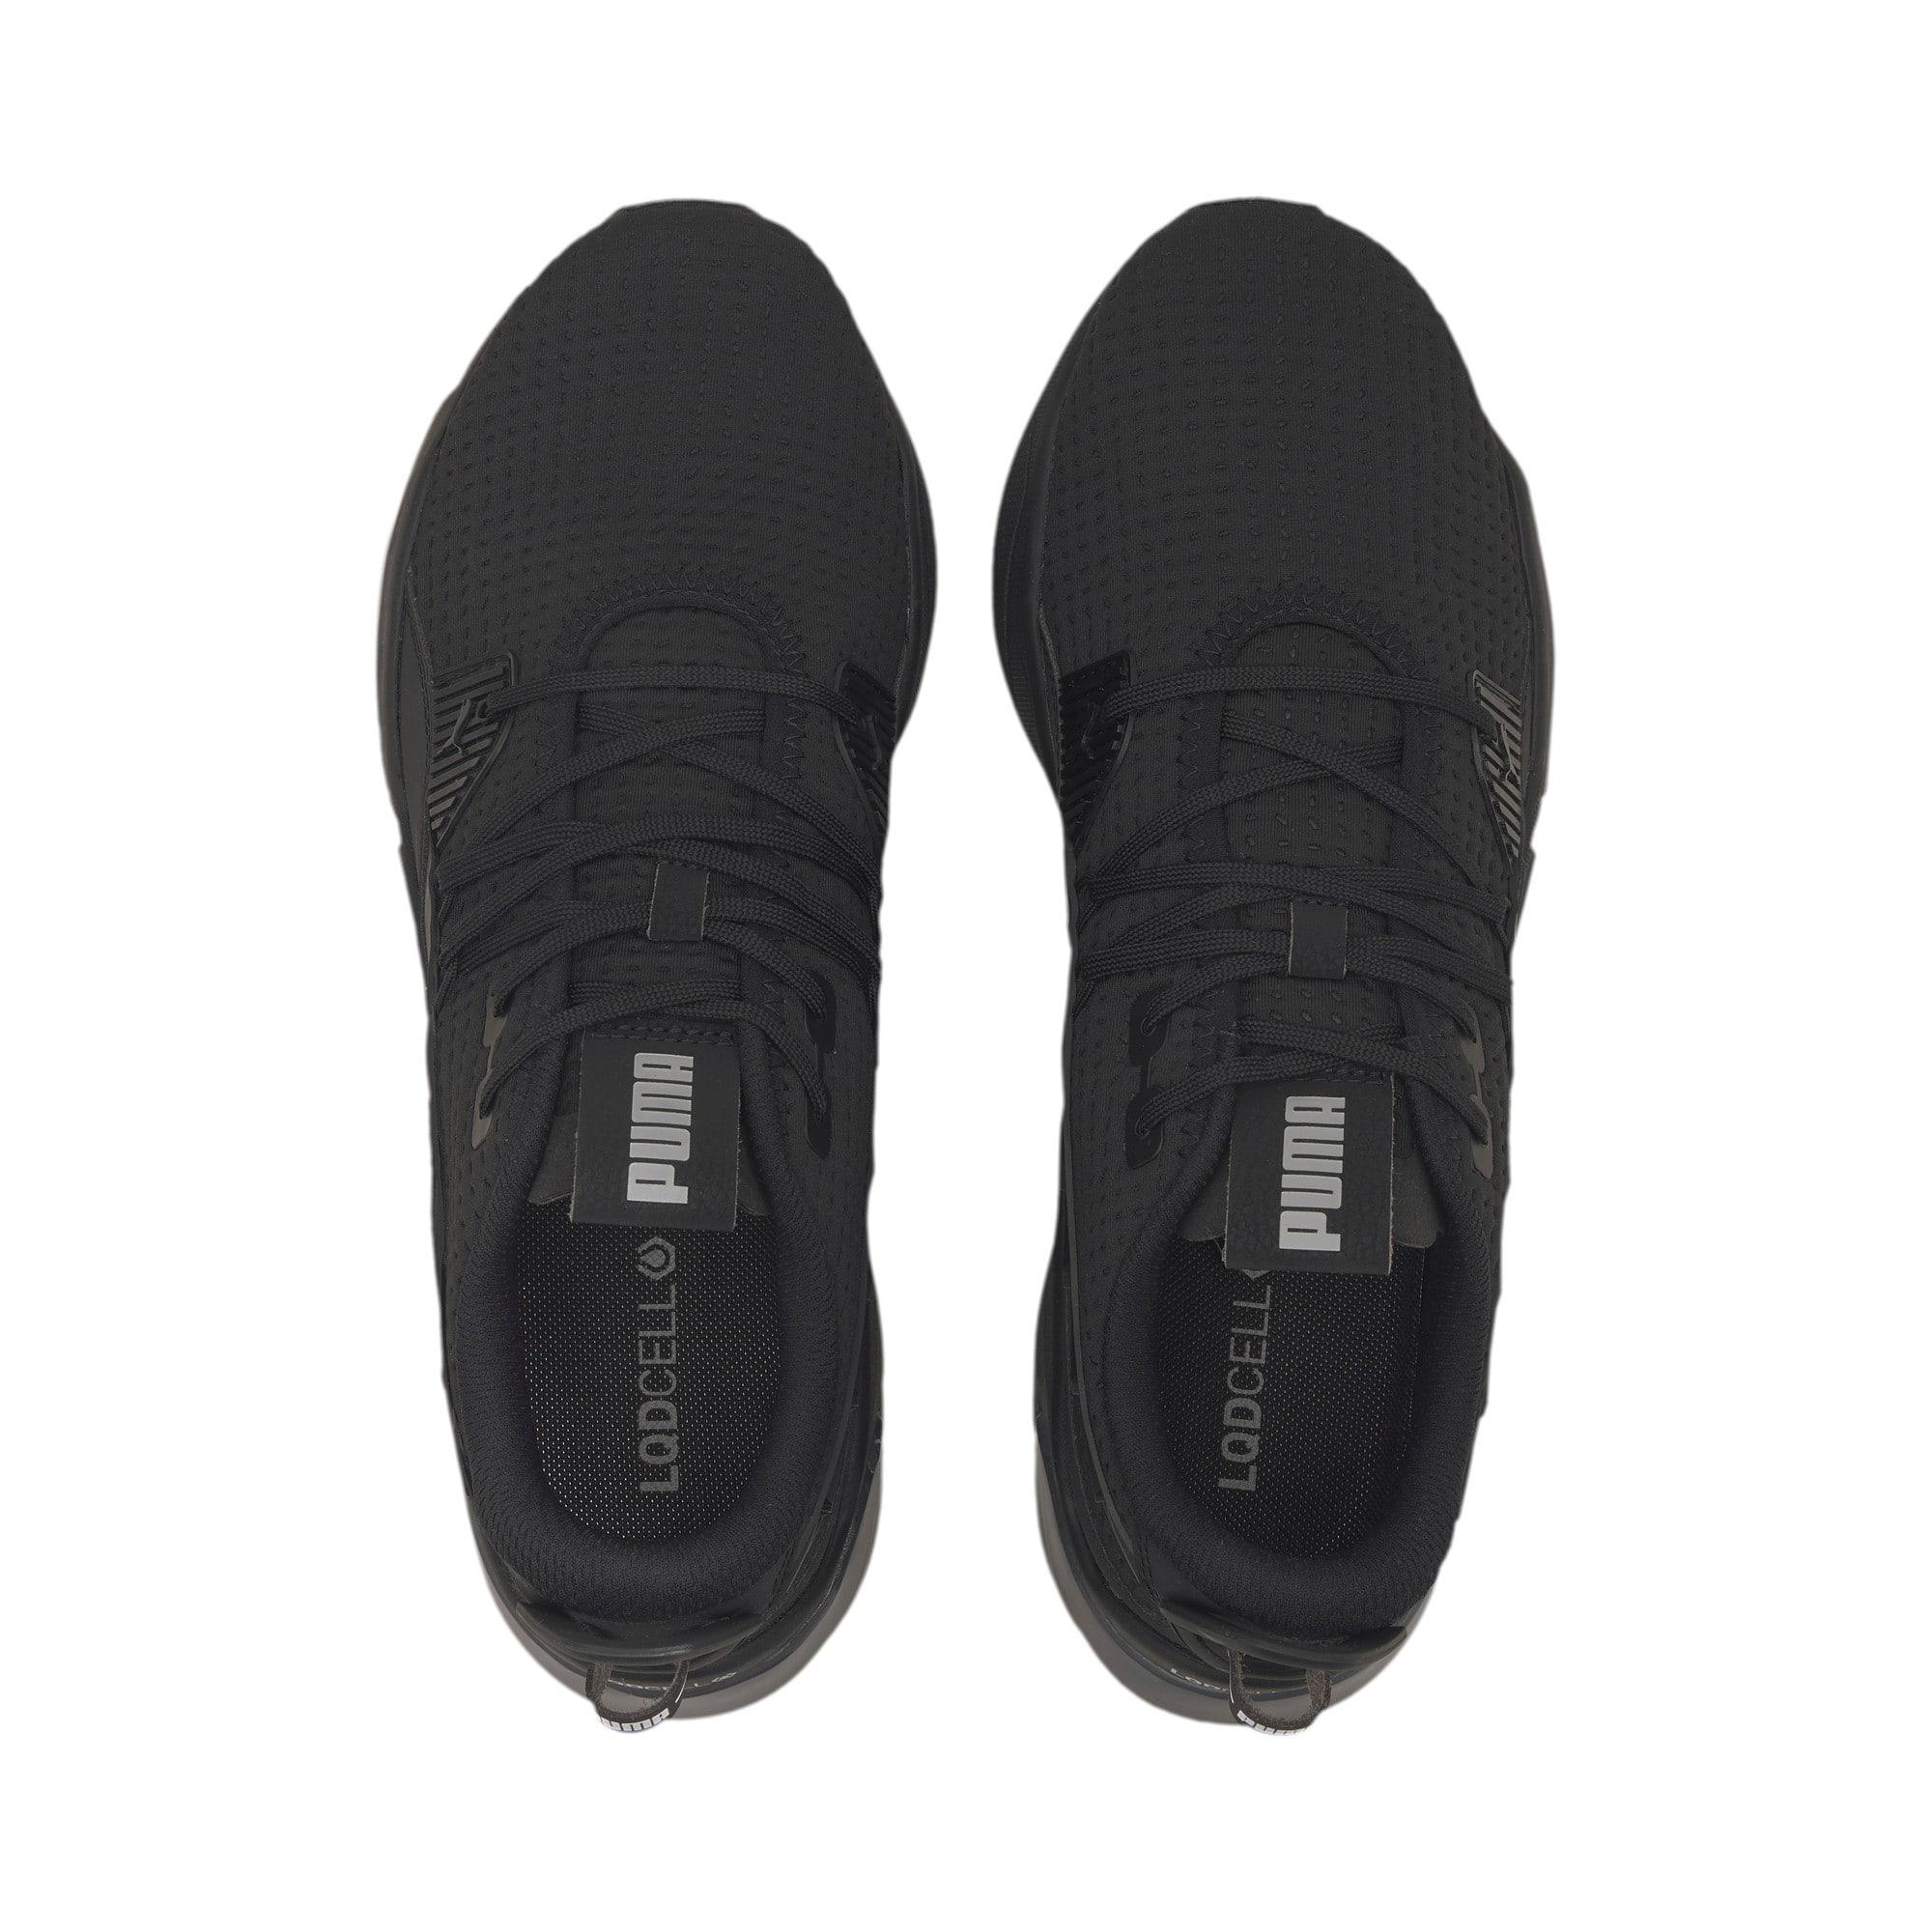 Thumbnail 7 of LQDCELL Optic Flight Suit Men's Training Shoes, Puma Black, medium